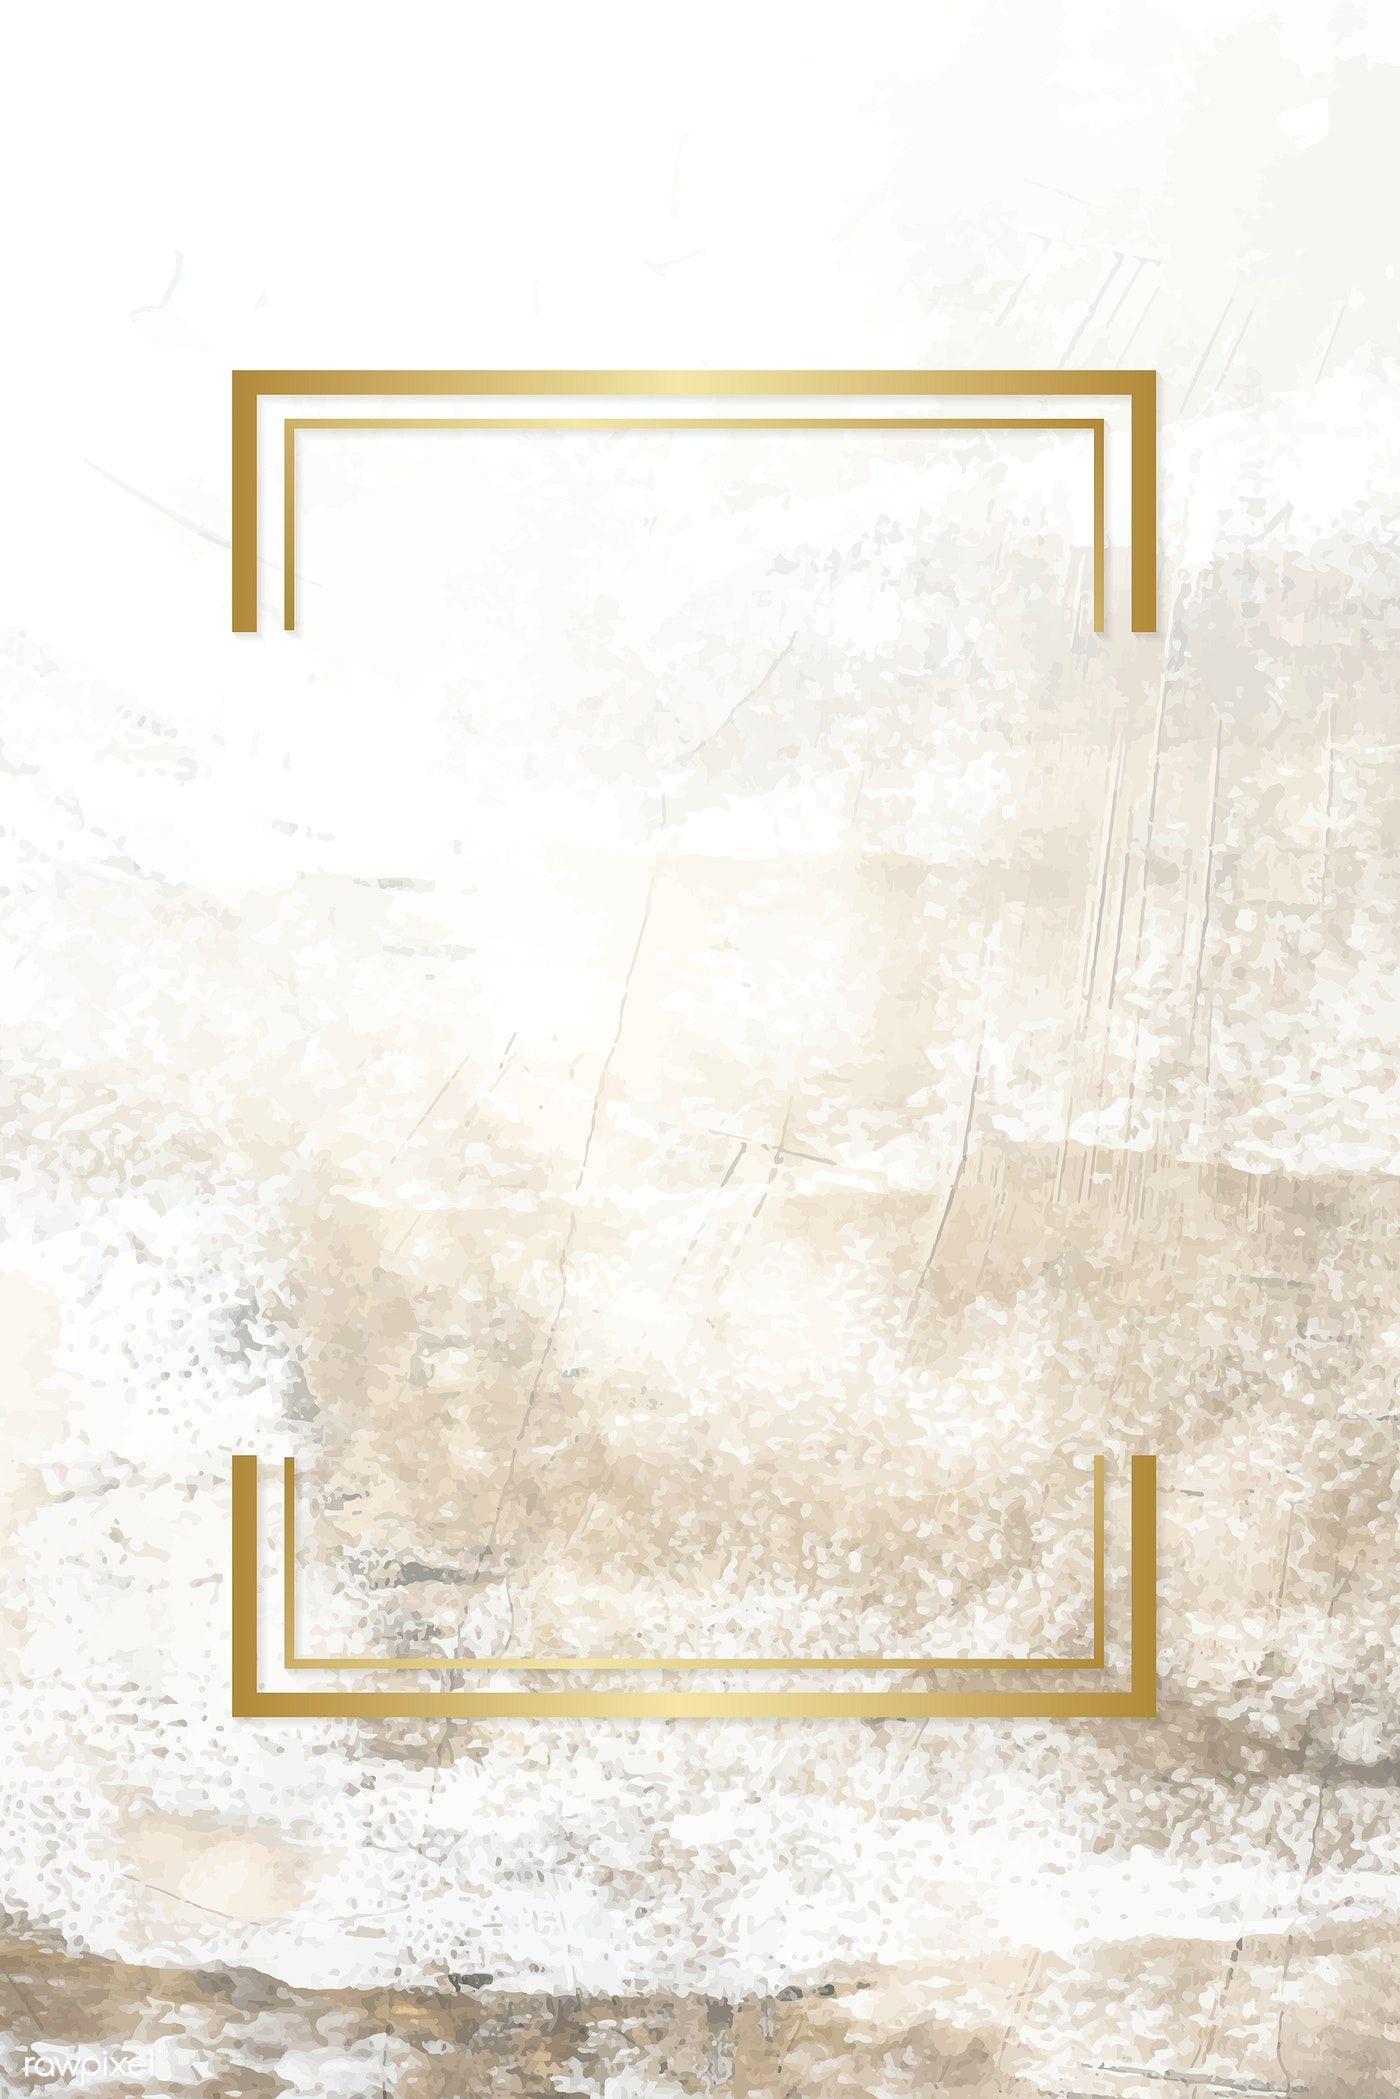 Golden Framed Badge On A Grunge Textured Vector Free Image By Rawpixel Com Adj Gold Wallpaper Background Floral Wallpaper Phone Phone Wallpaper Patterns